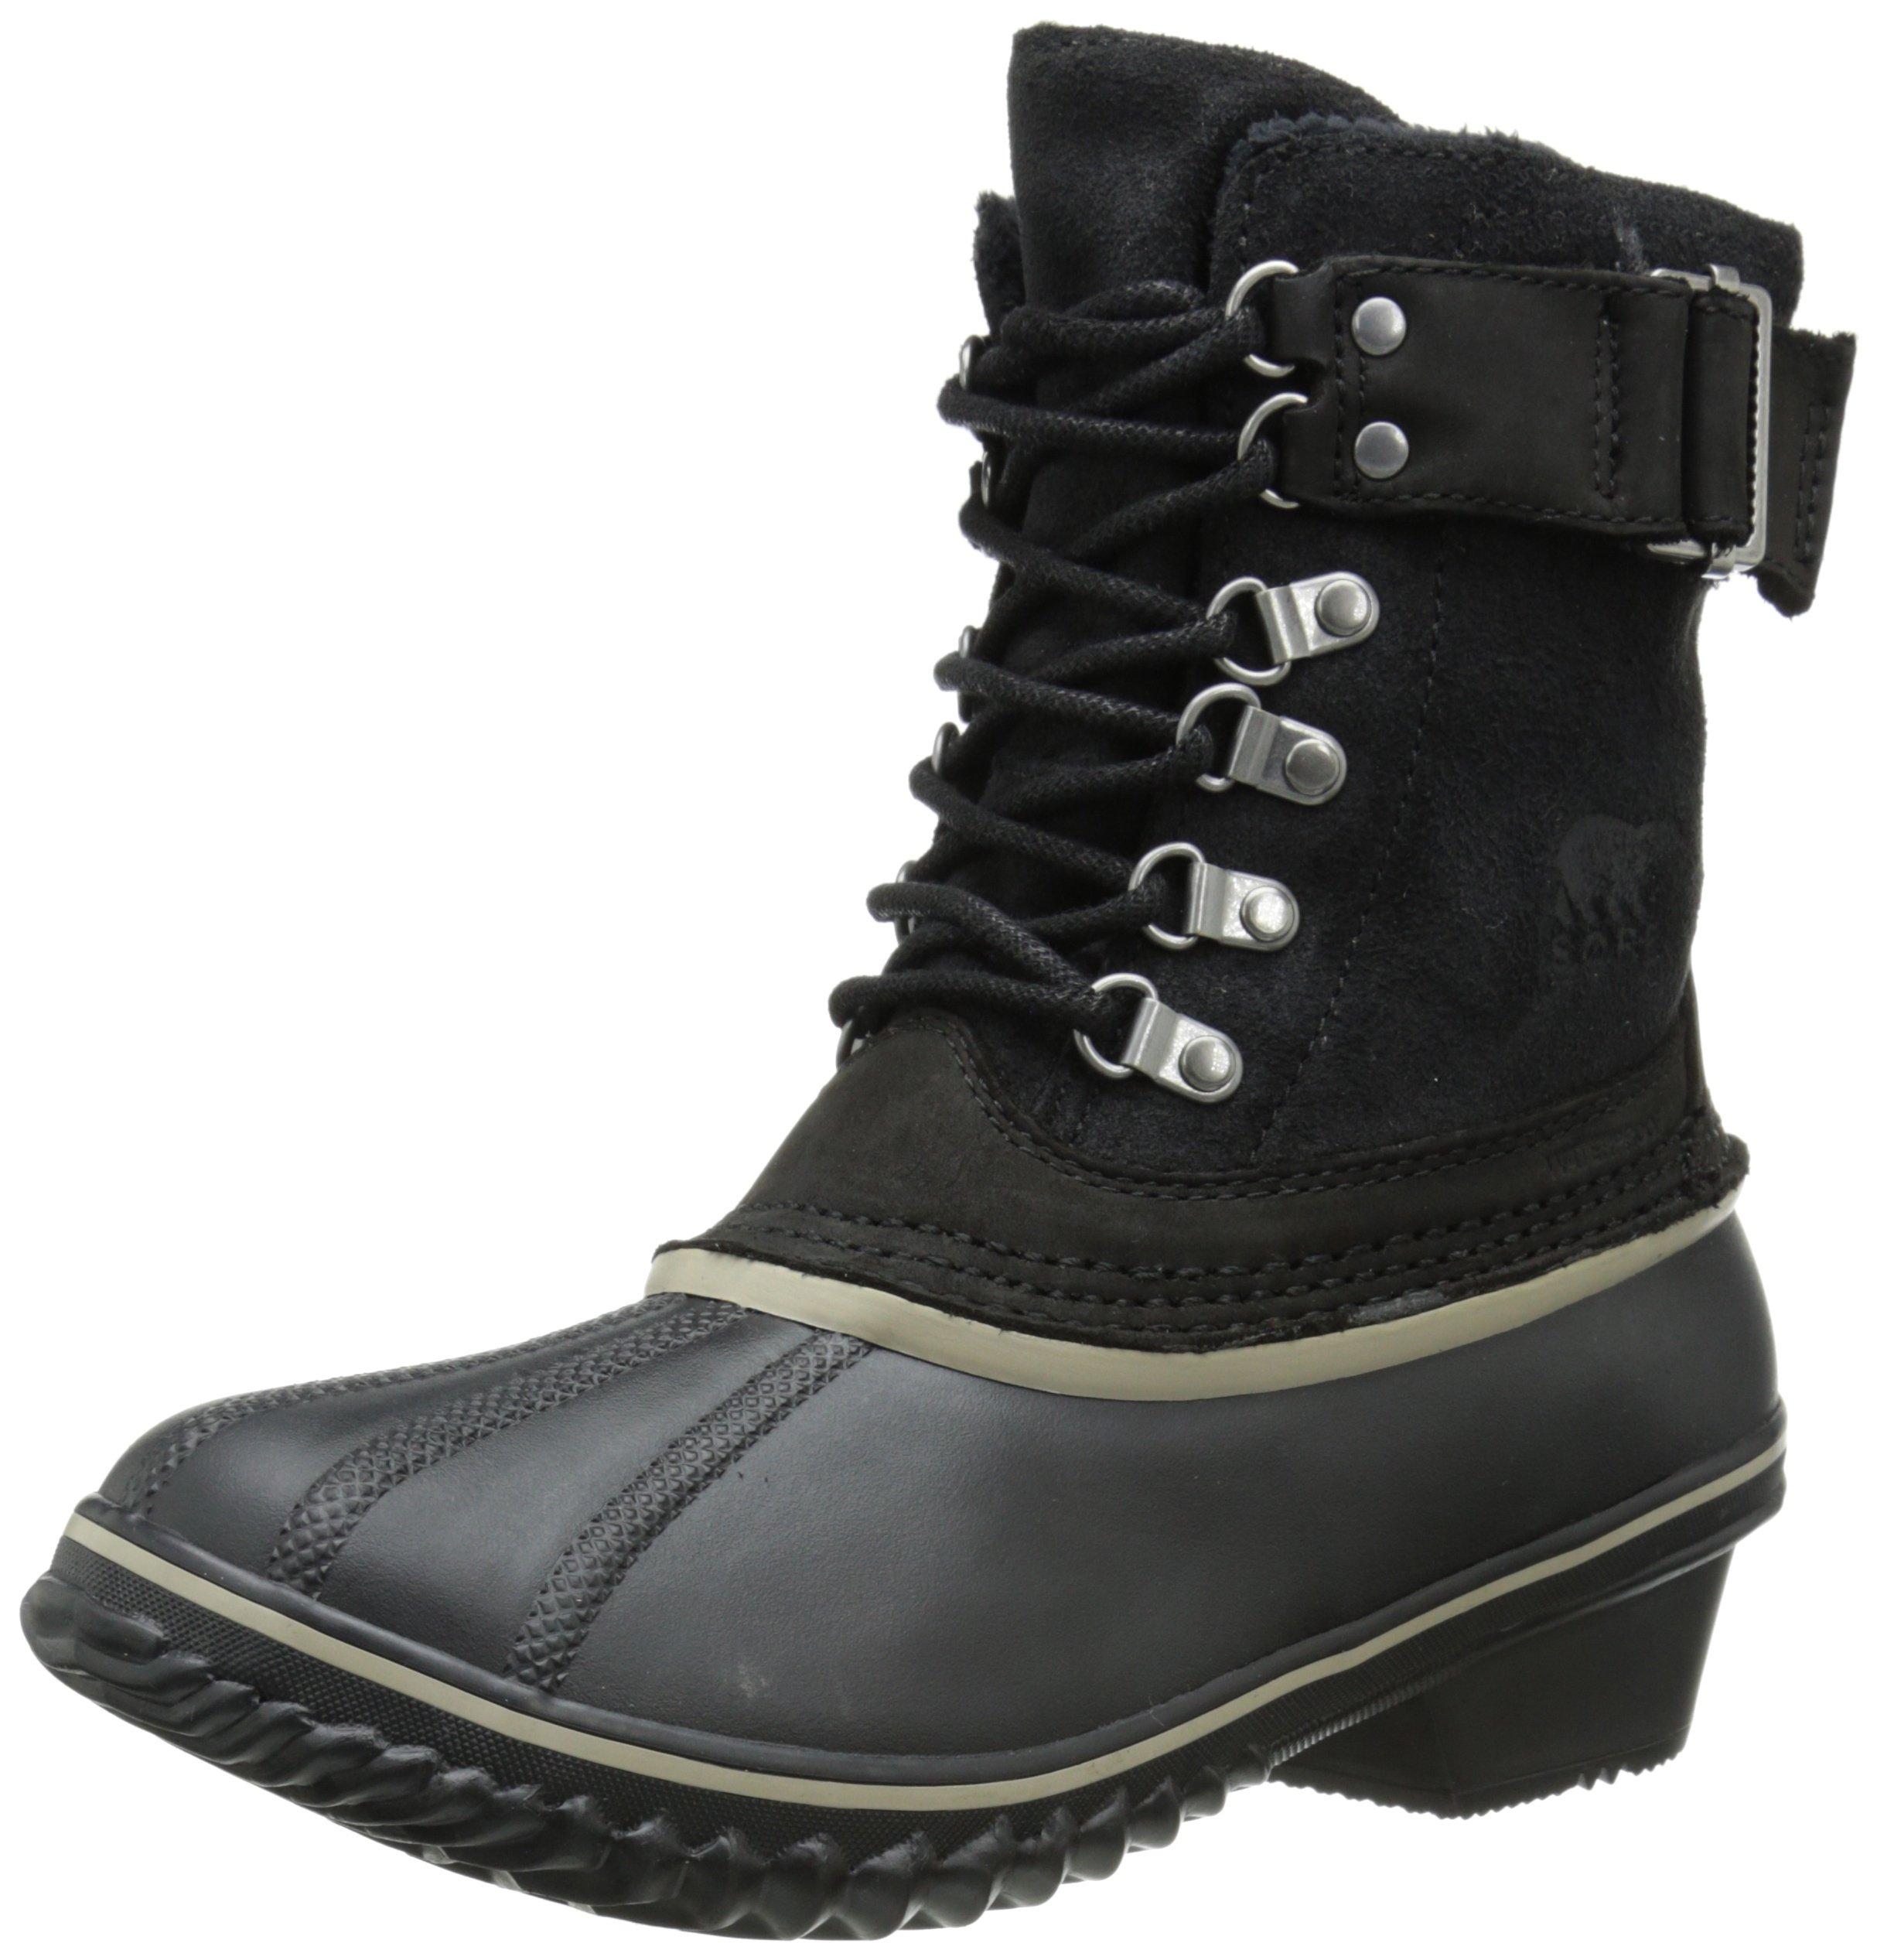 Sorel Women's Winter Fancy Lace II Cold Weather Boot, Black/Silver/Sage, 6.5 M US